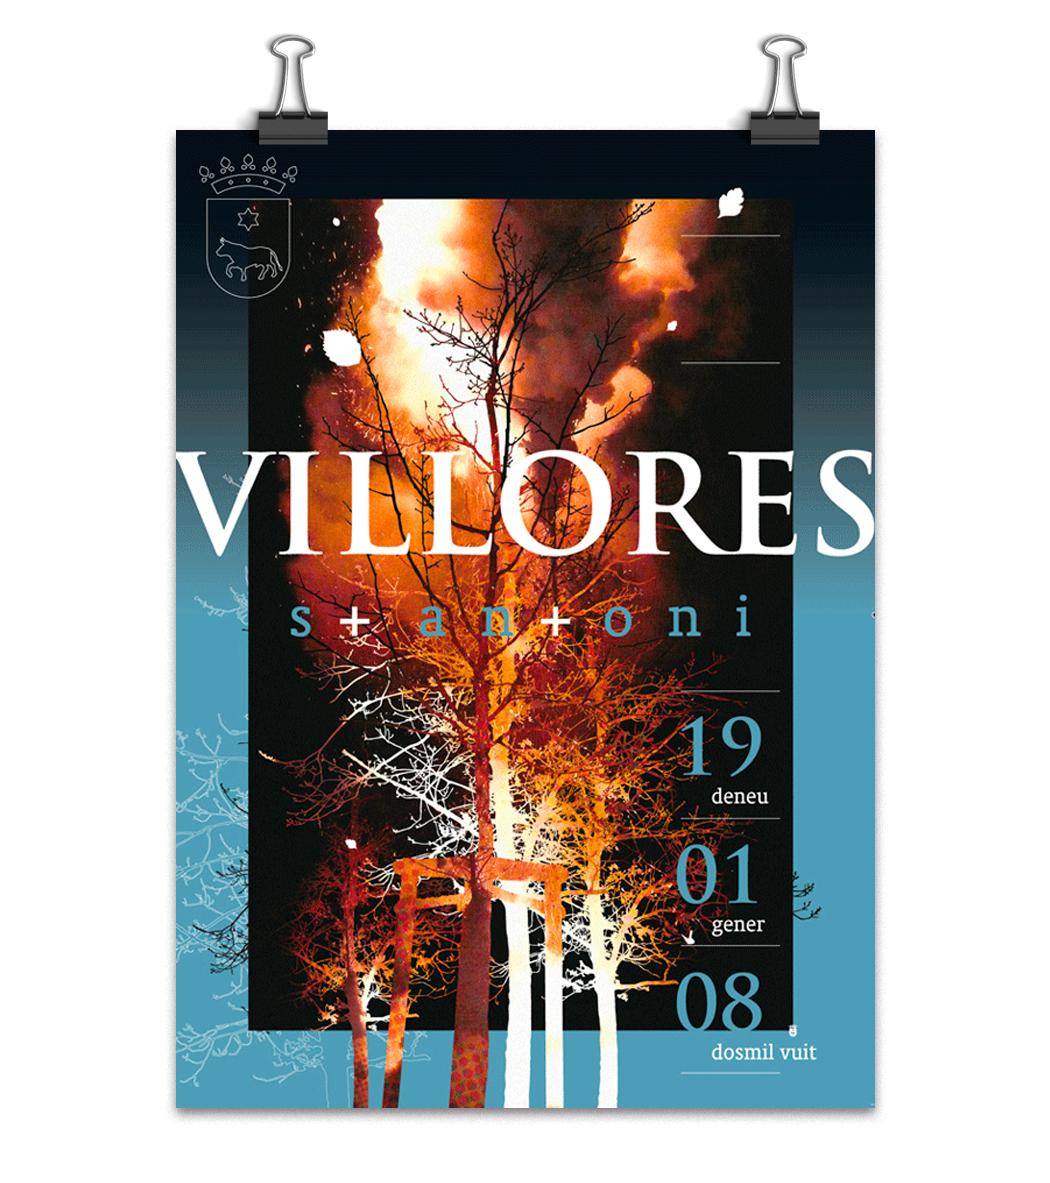 villores_poster_02